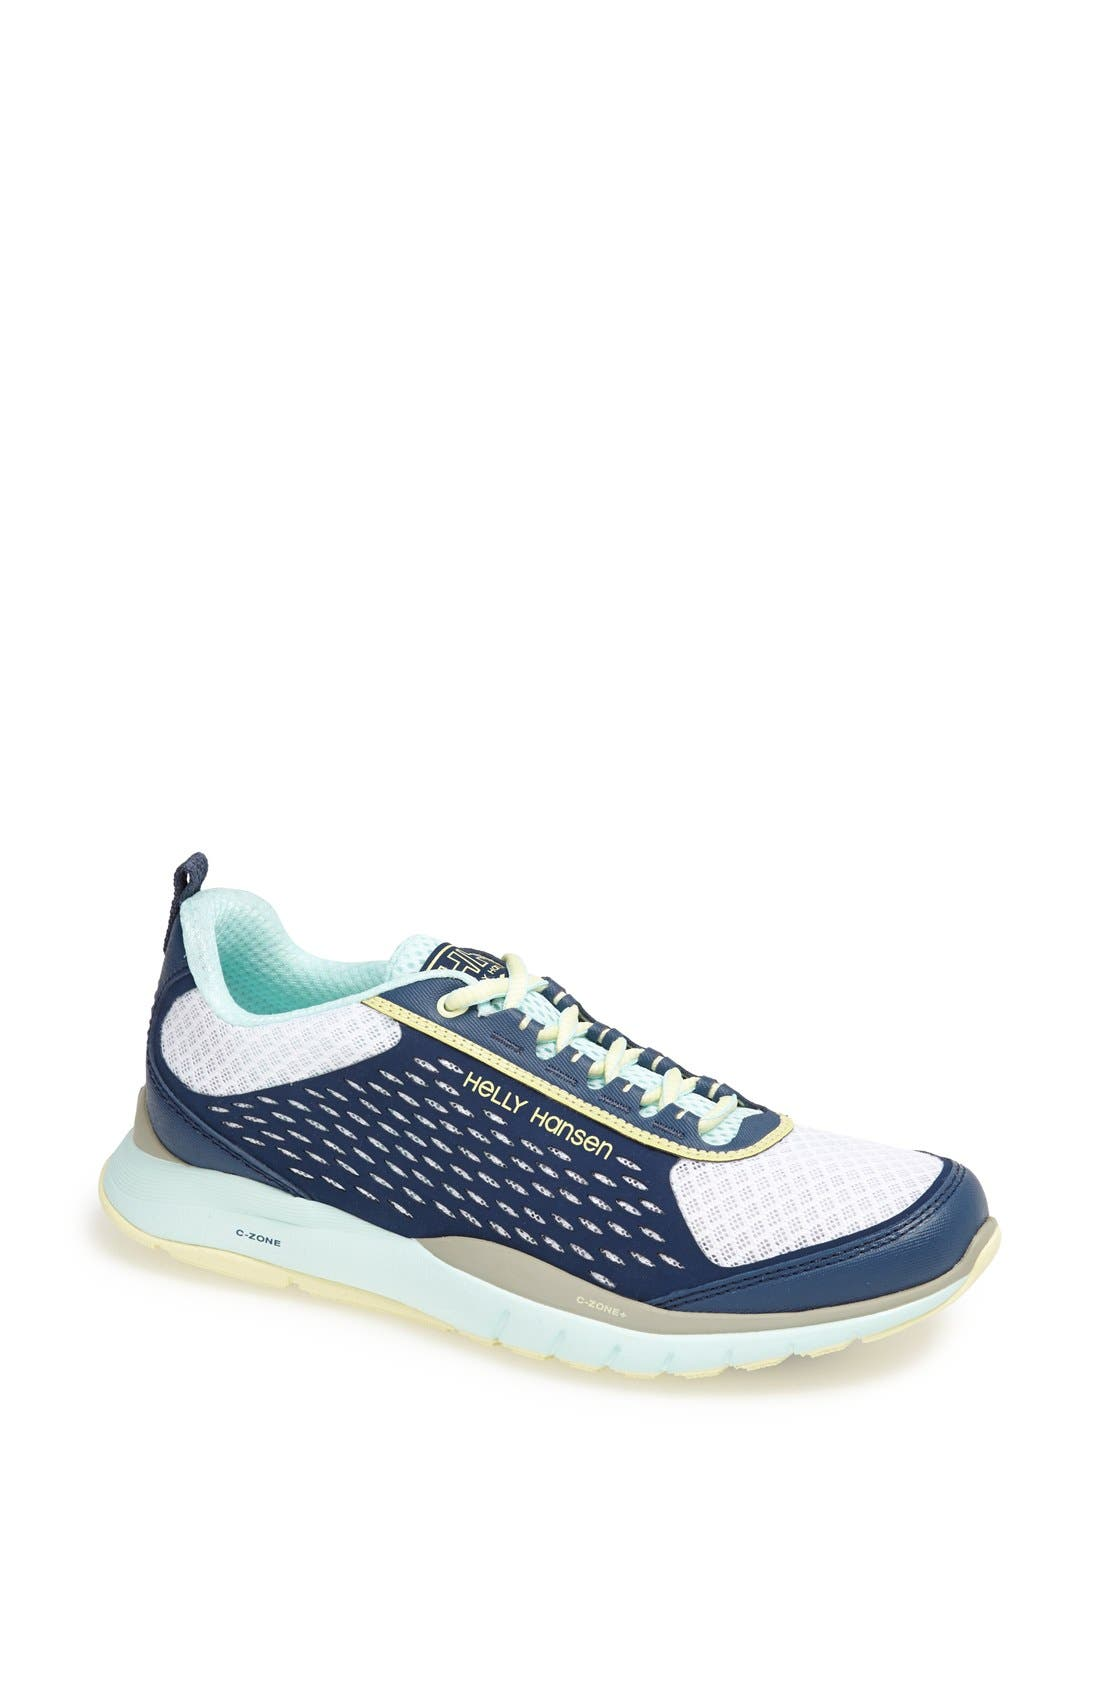 Alternate Image 1 Selected - Helly Hansen 'Panarena' Running Shoe (Women)